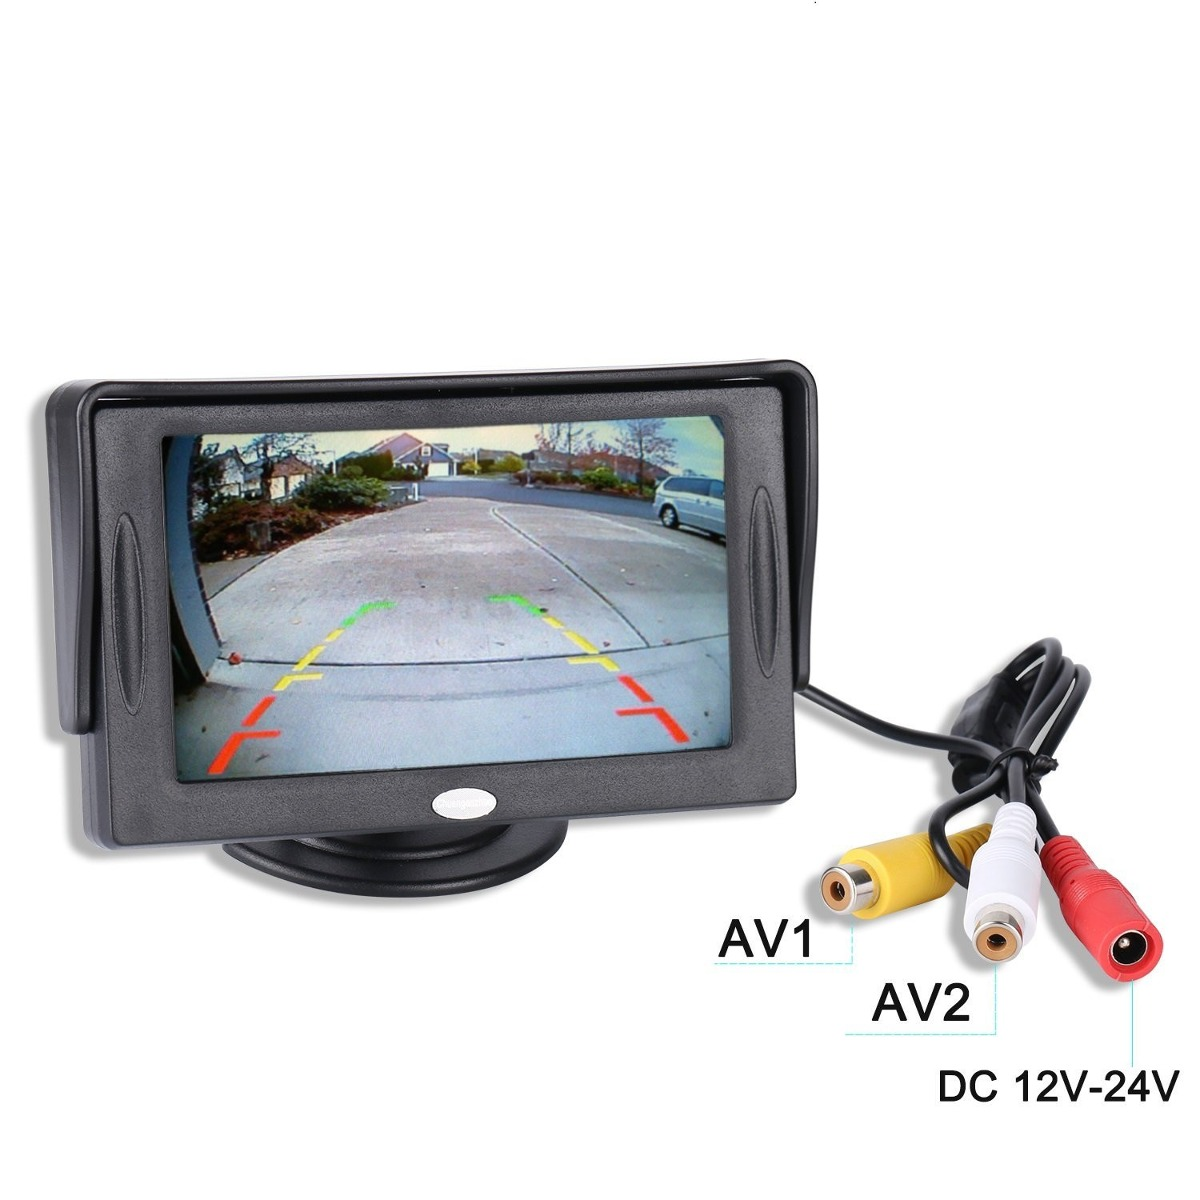 ITK TECHNOLOGY ITKC650T430 Monitor LCD en Espejo de 4.3 Pulgadas Pantalla con l/íneas de gu/ía Visi/ón Nocturna 8 Leds Sistema de visi/ón Trasera C/ámara Impermeable